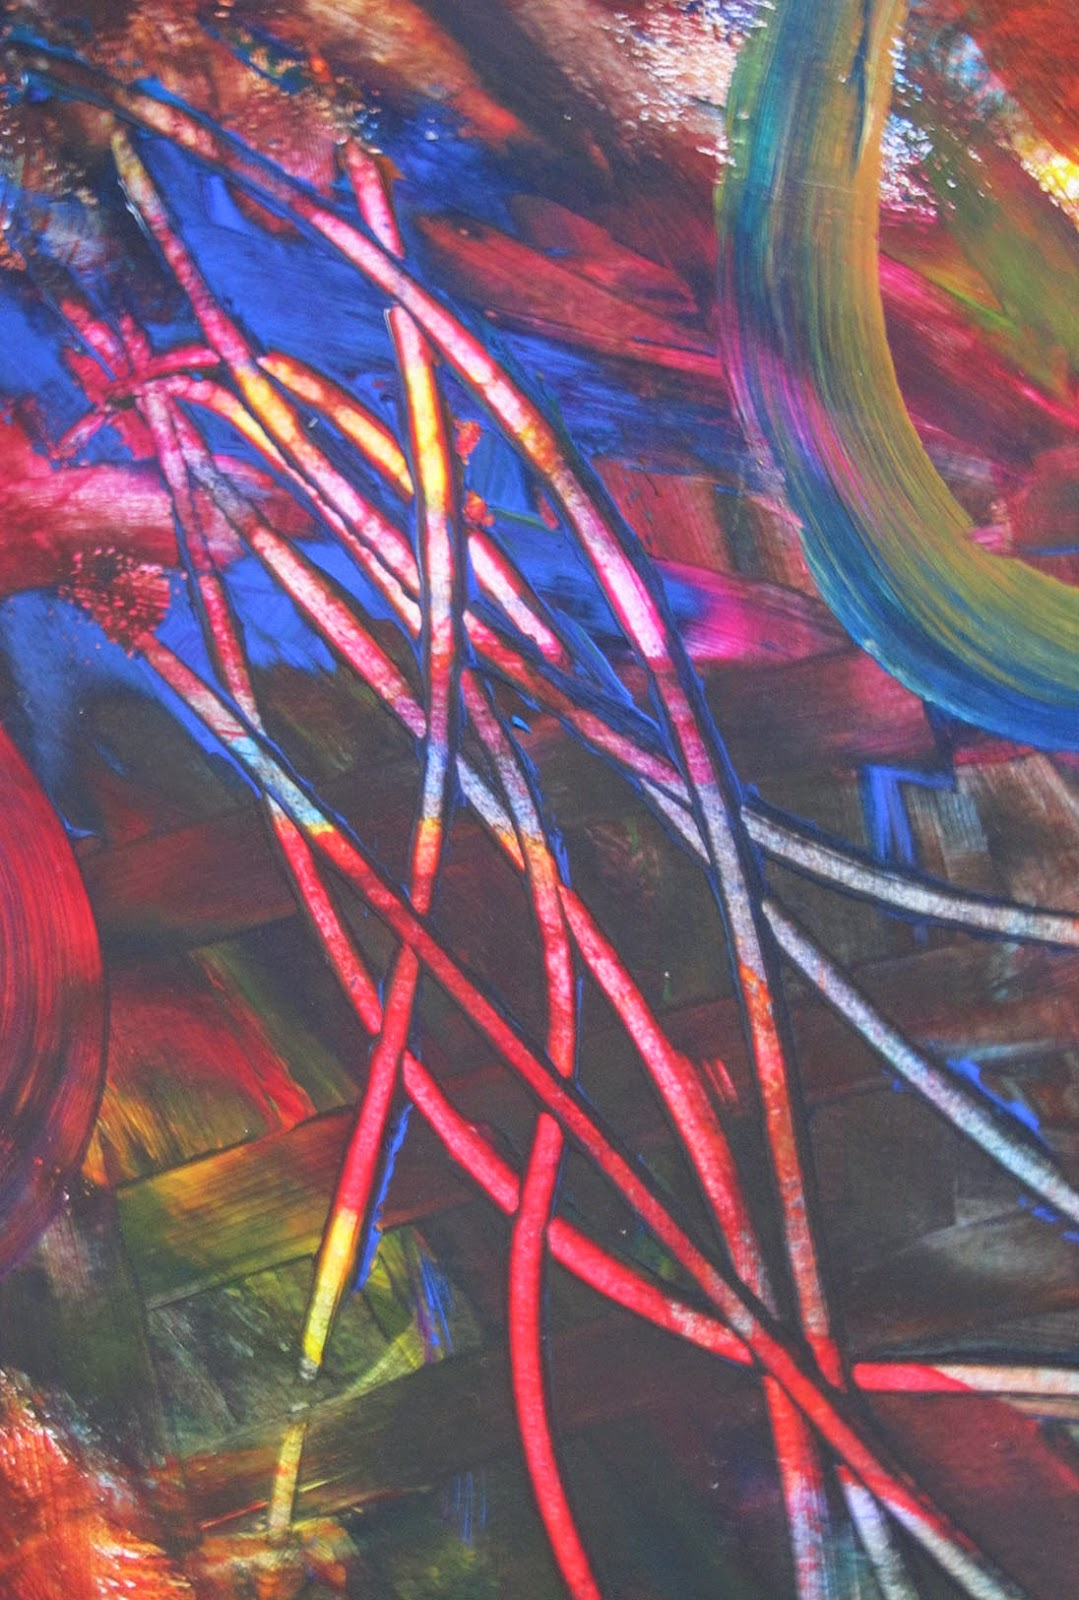 scratches through paint